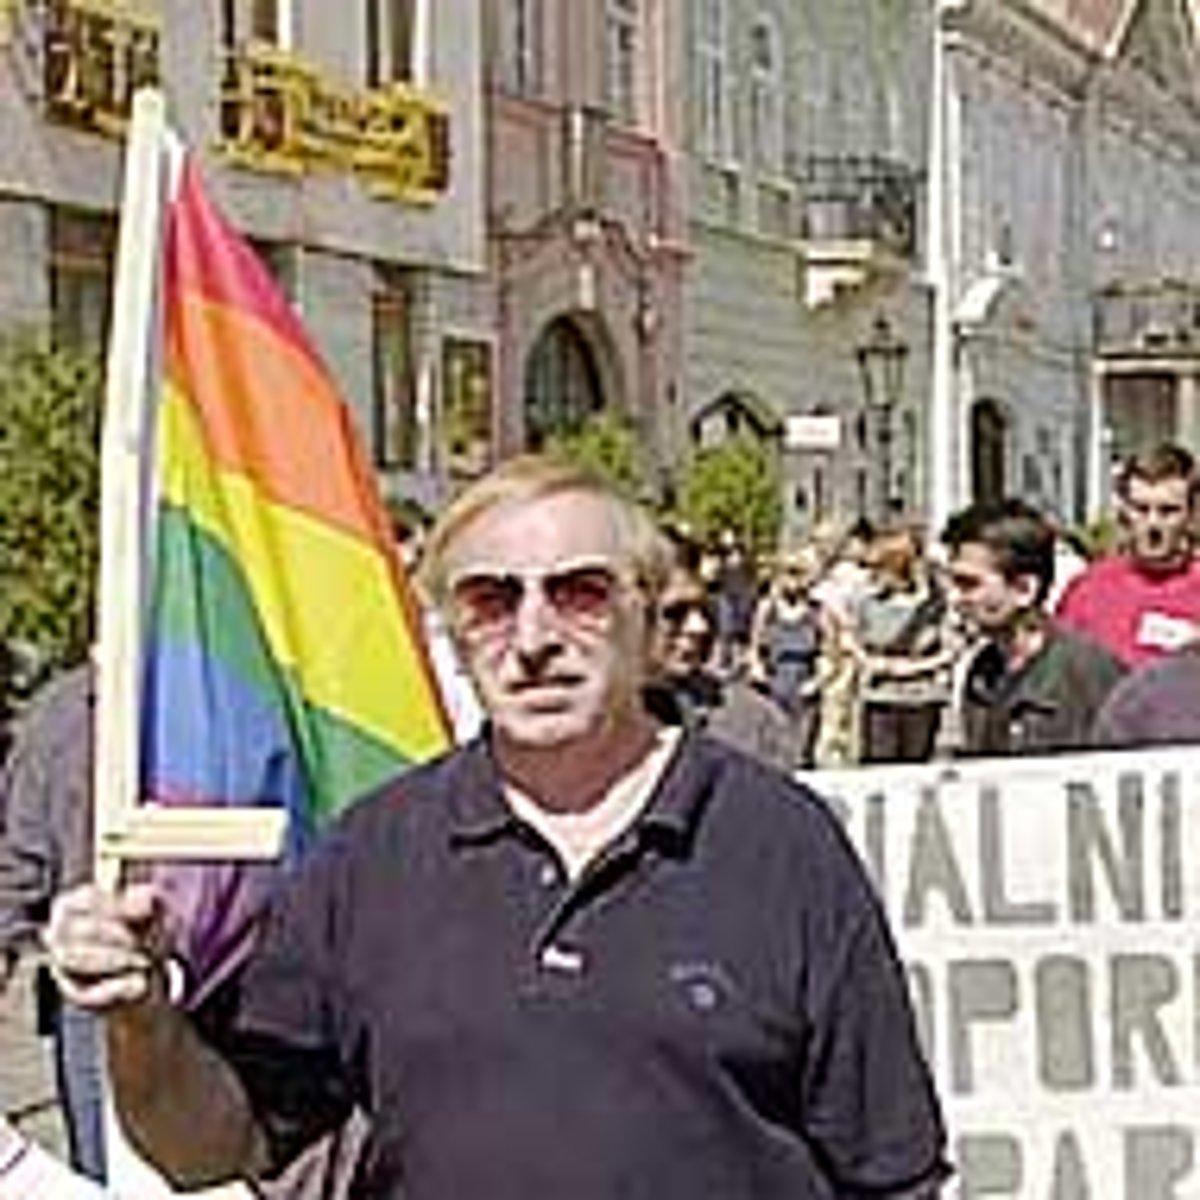 Not Lesbians against job discrimination can suggest